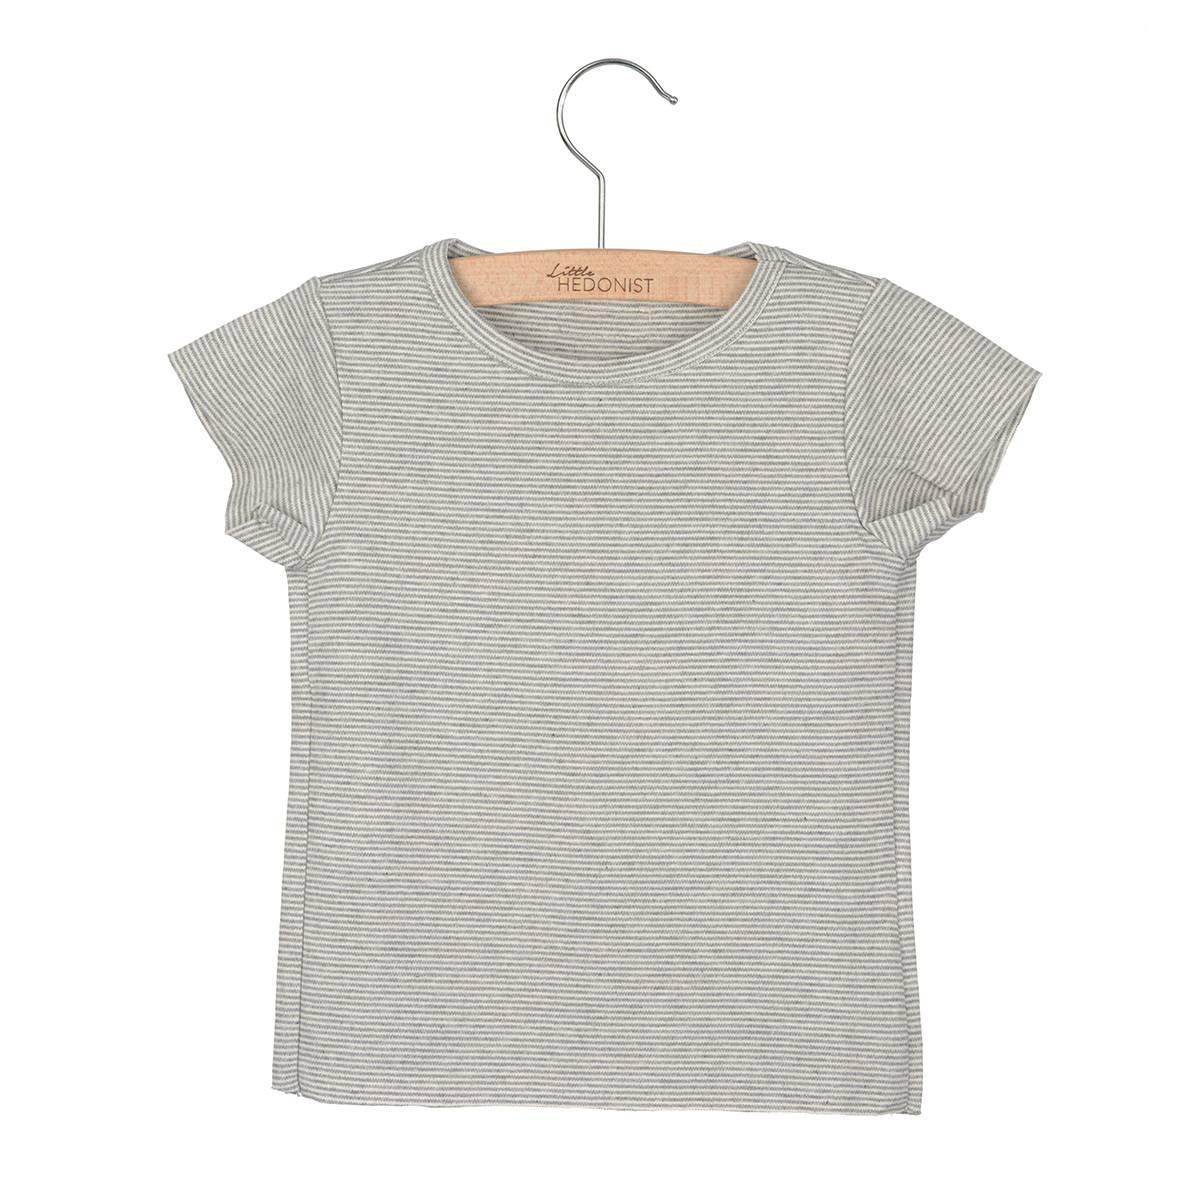 Summer shirt grey striped little hedonist Grey striped t shirt